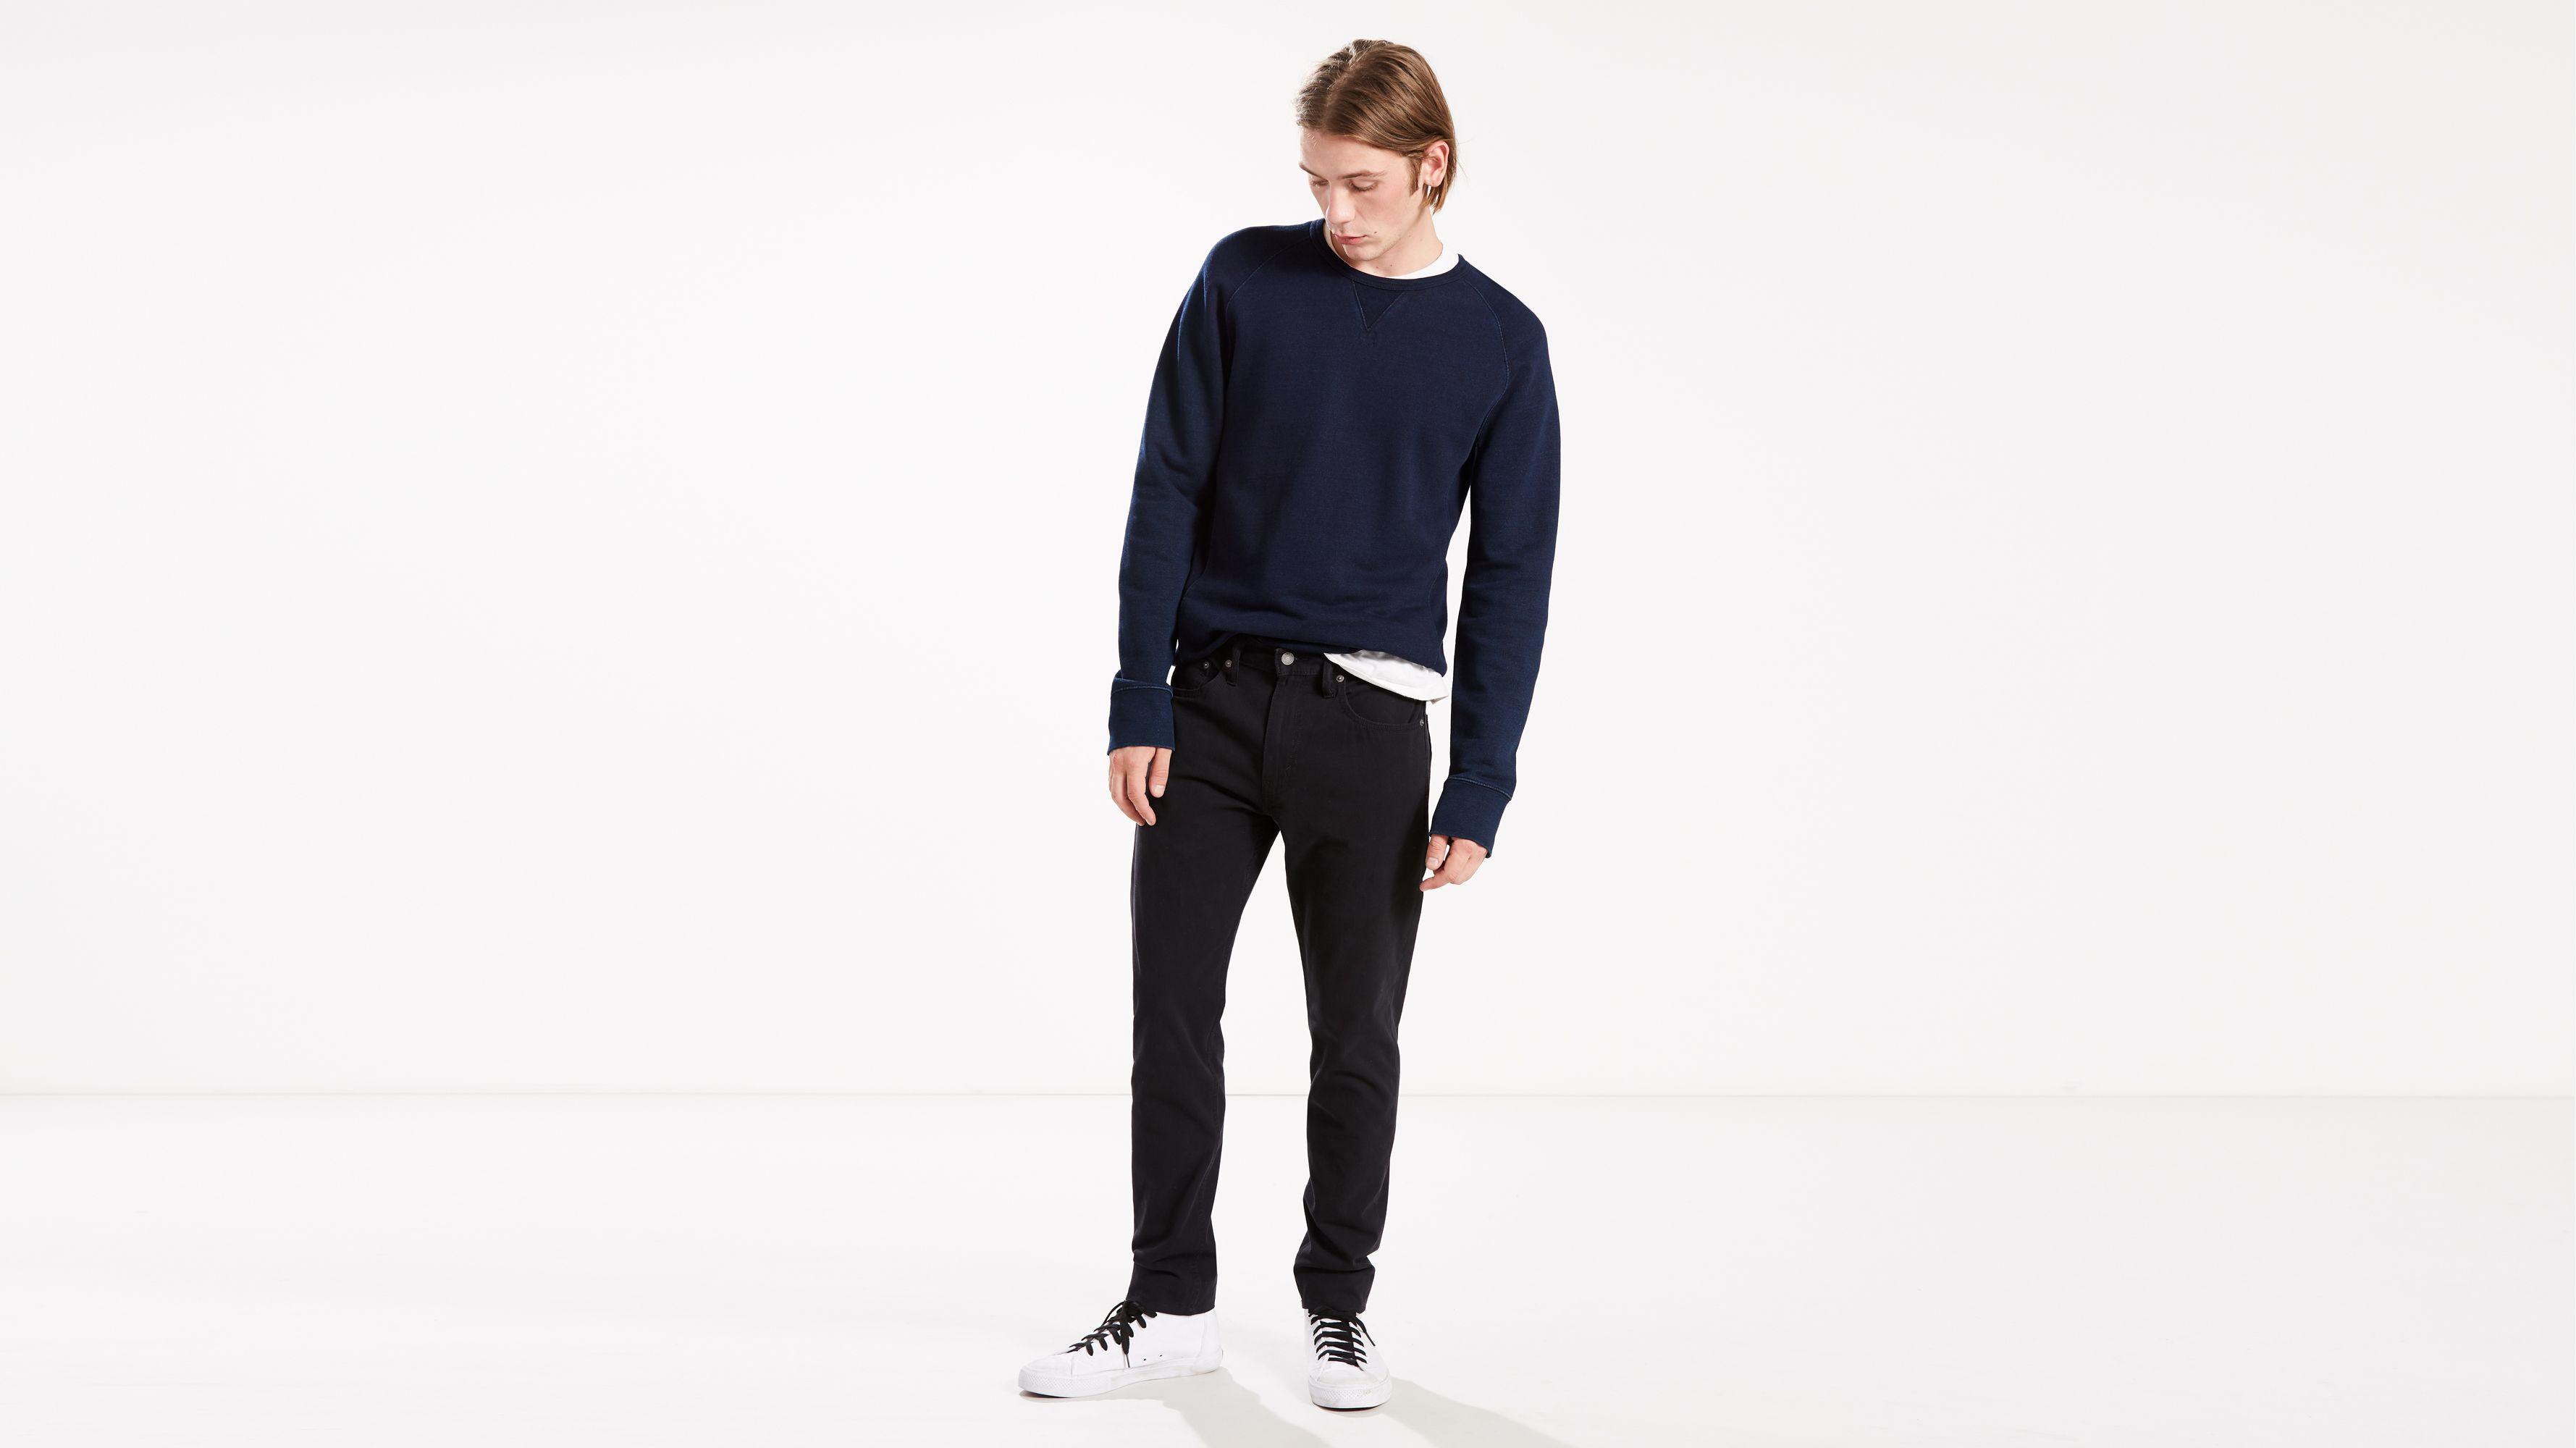 512™ Slim Taper Fit Warp Stretch Jeans | Mineral Black |Levi's® Netherlands  (NL)